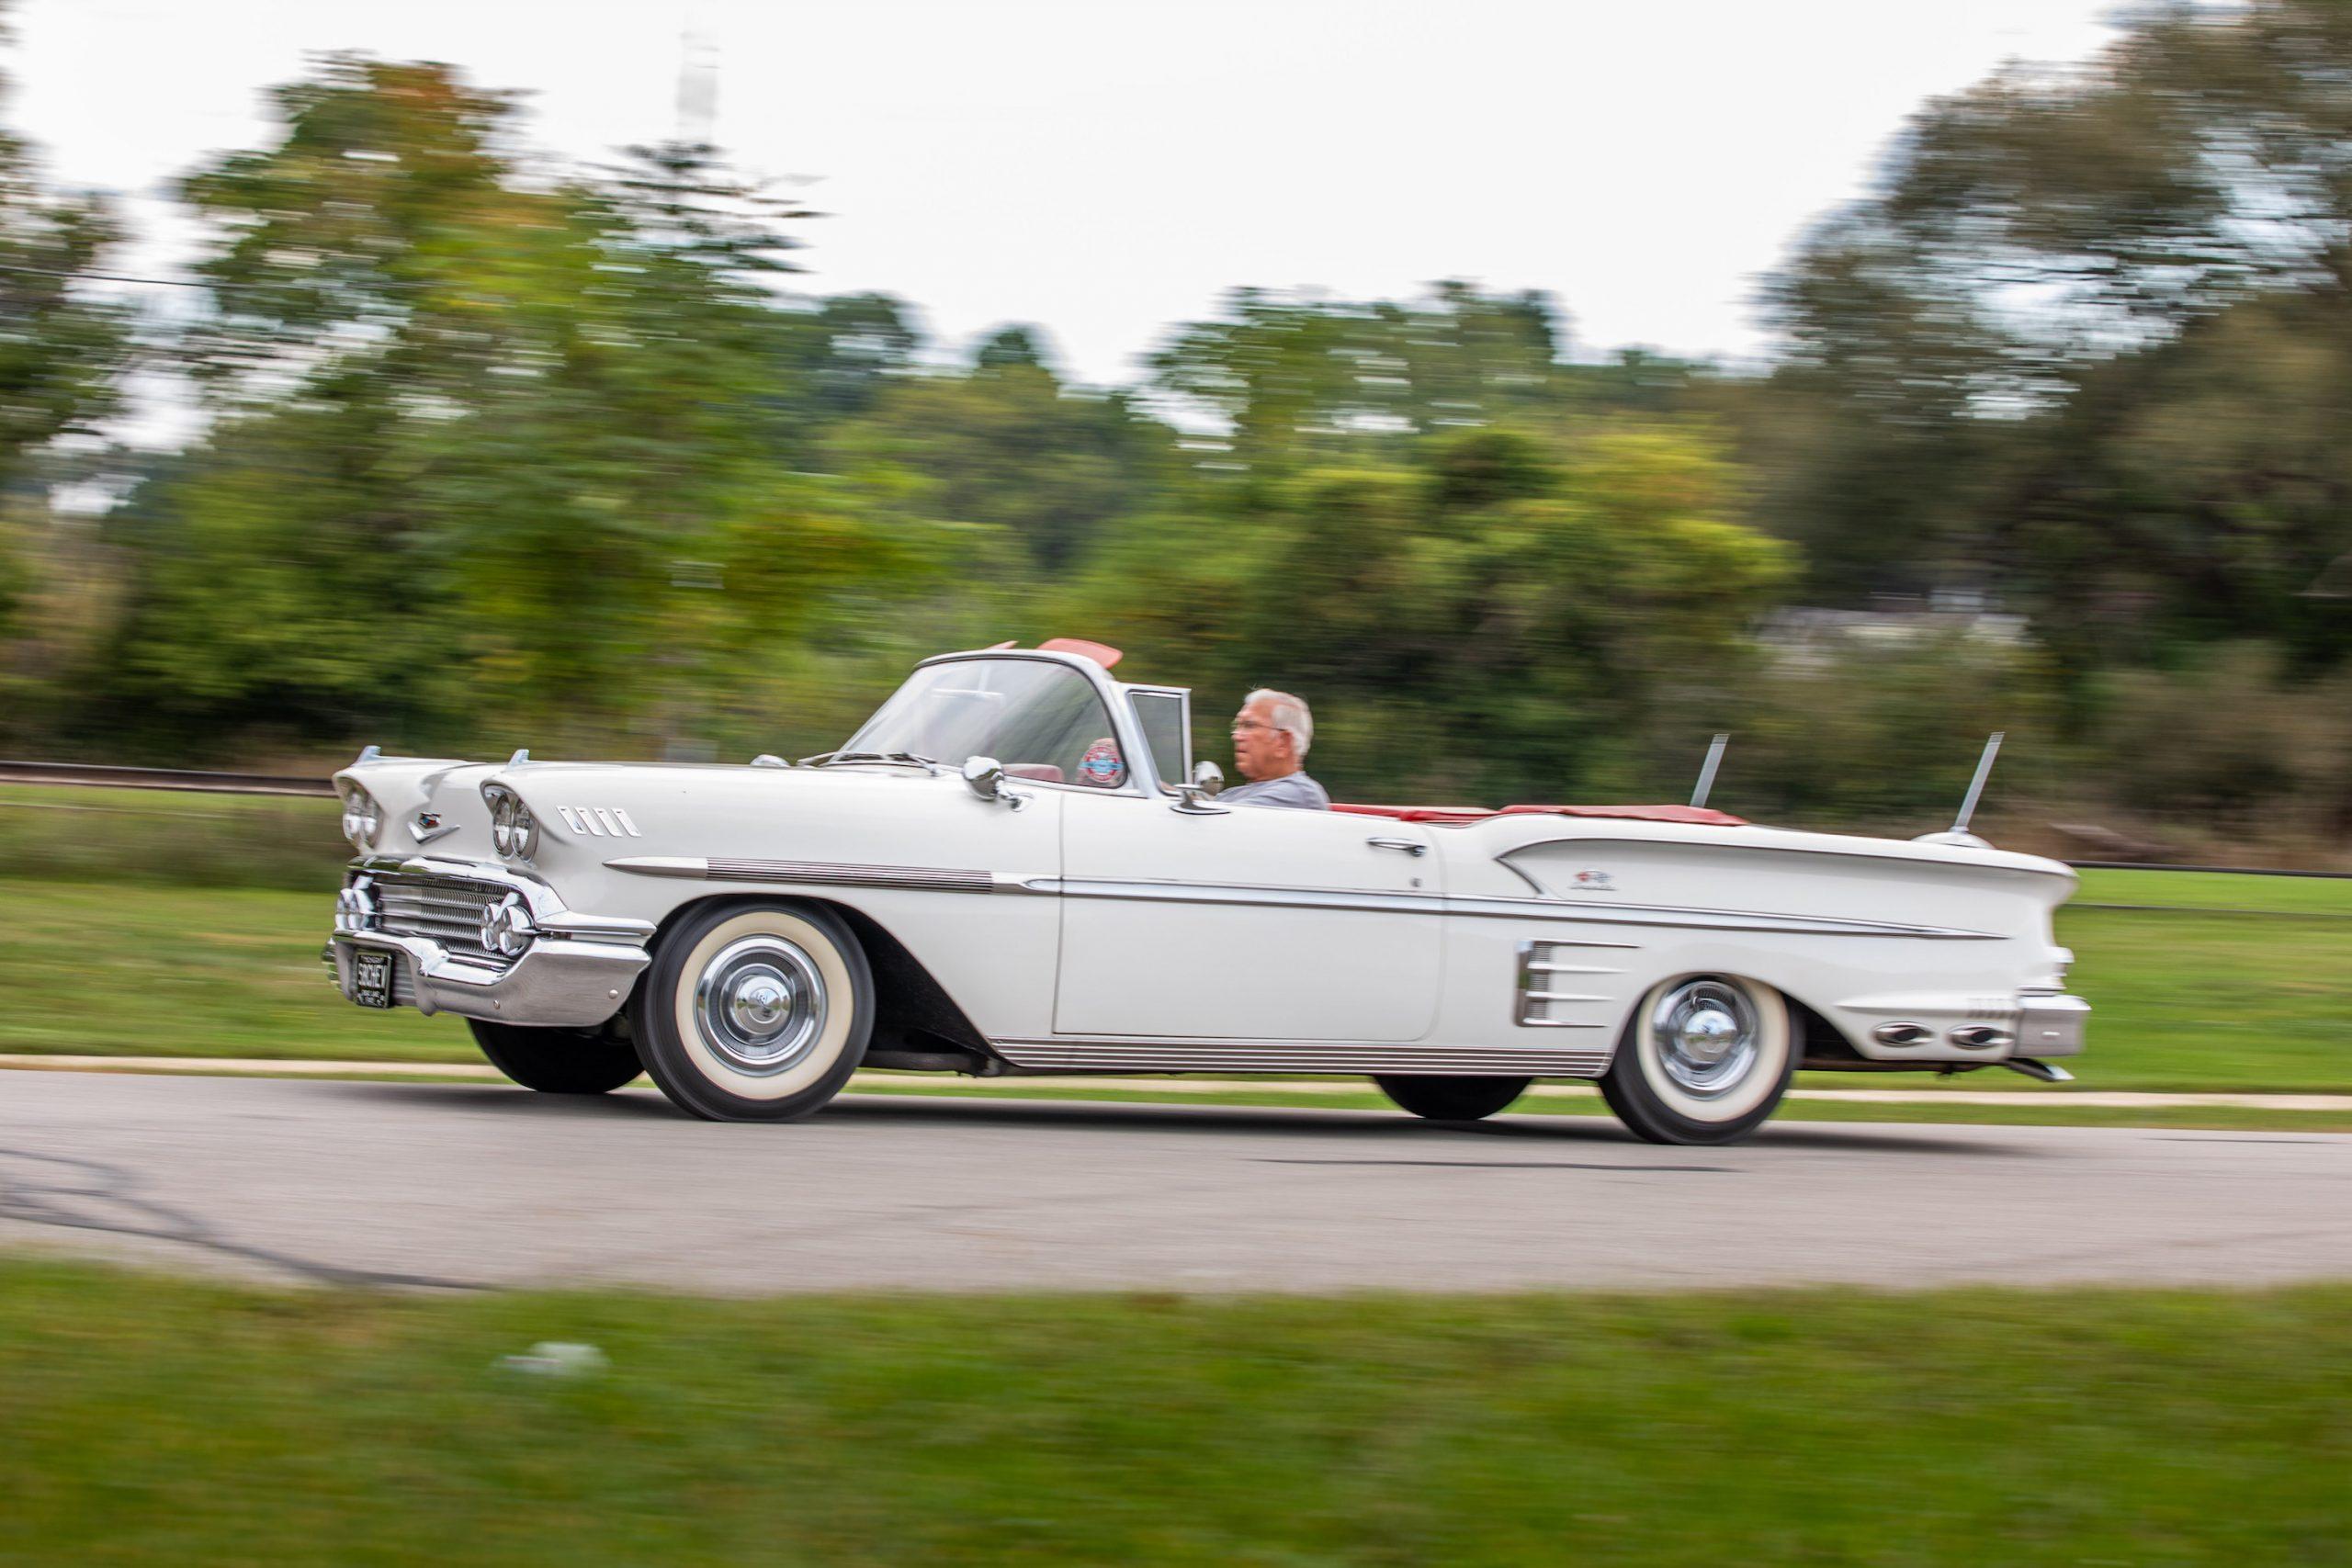 1958 Chevrolet Impala Convertible Action